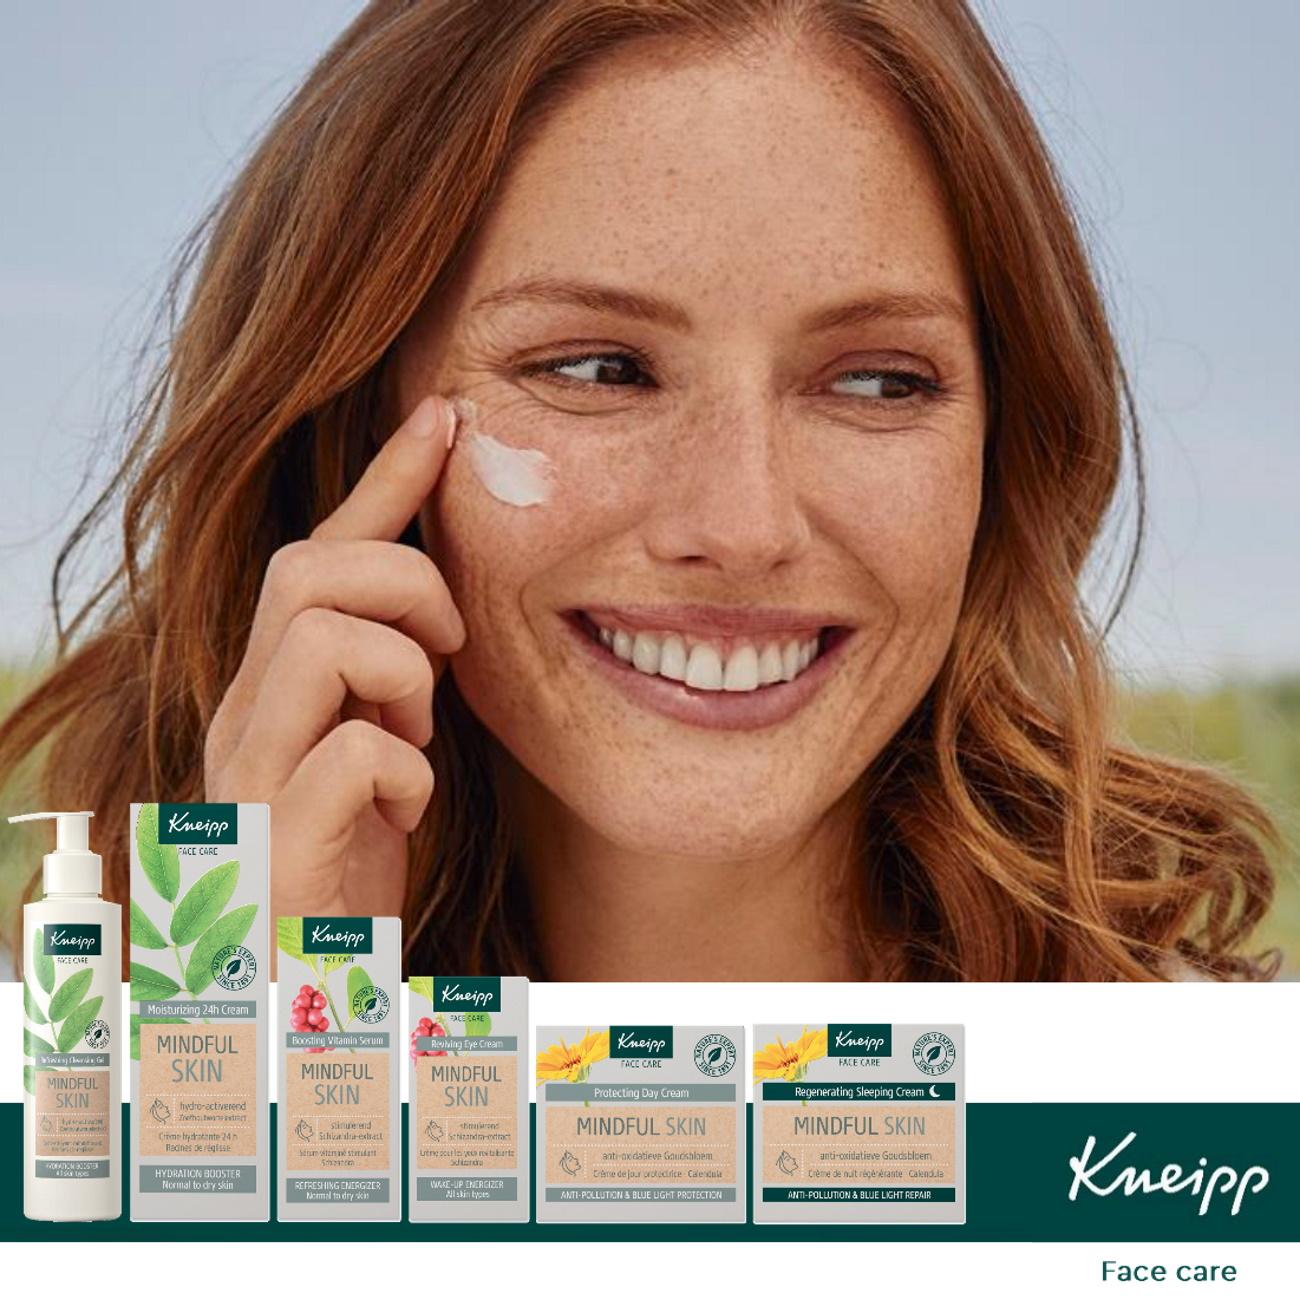 Persbericht: Kneipp Mindful skin verzorgingslijn